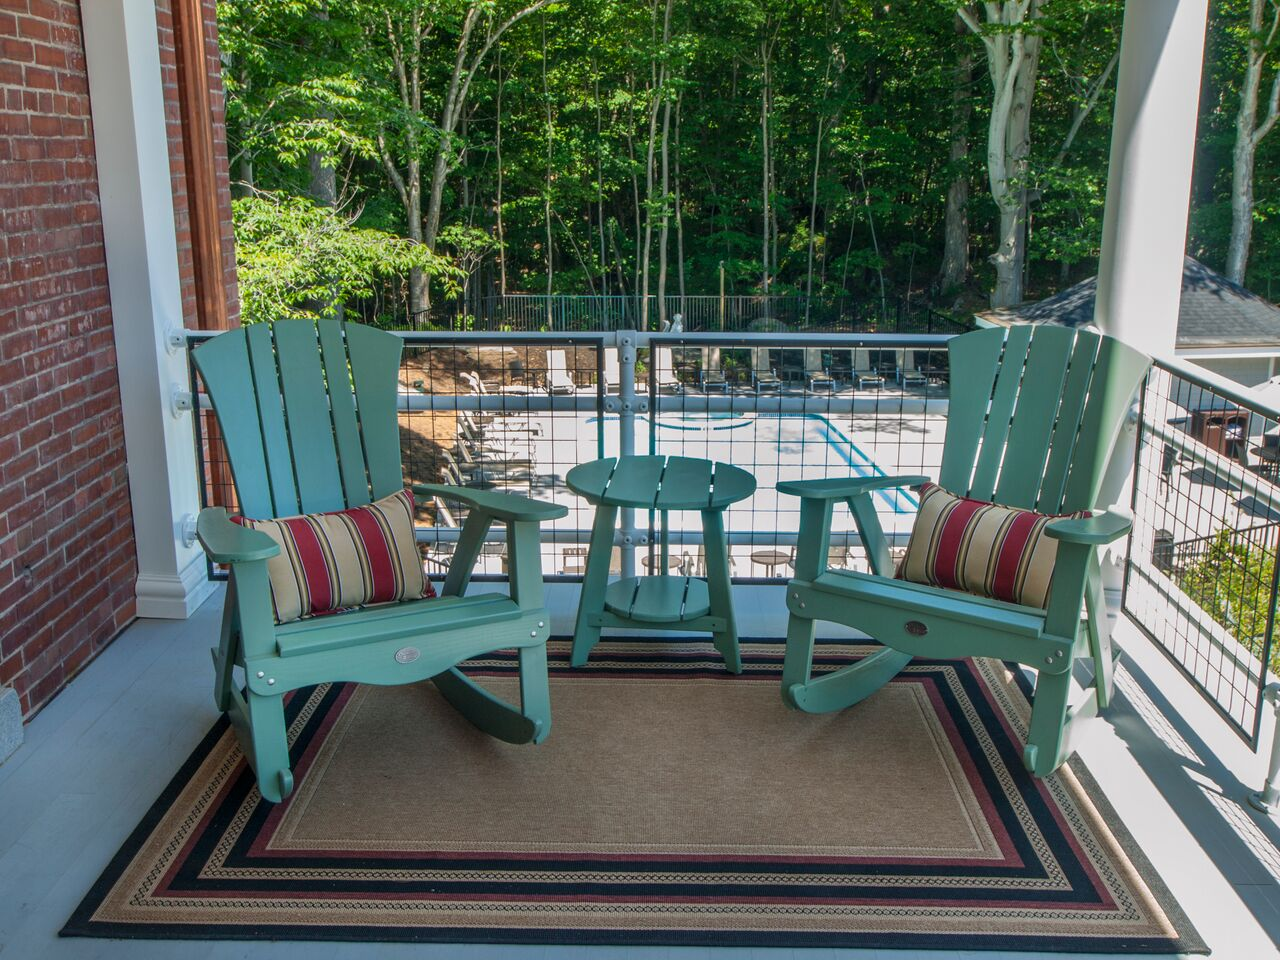 2 chairs on porch idc.jpeg